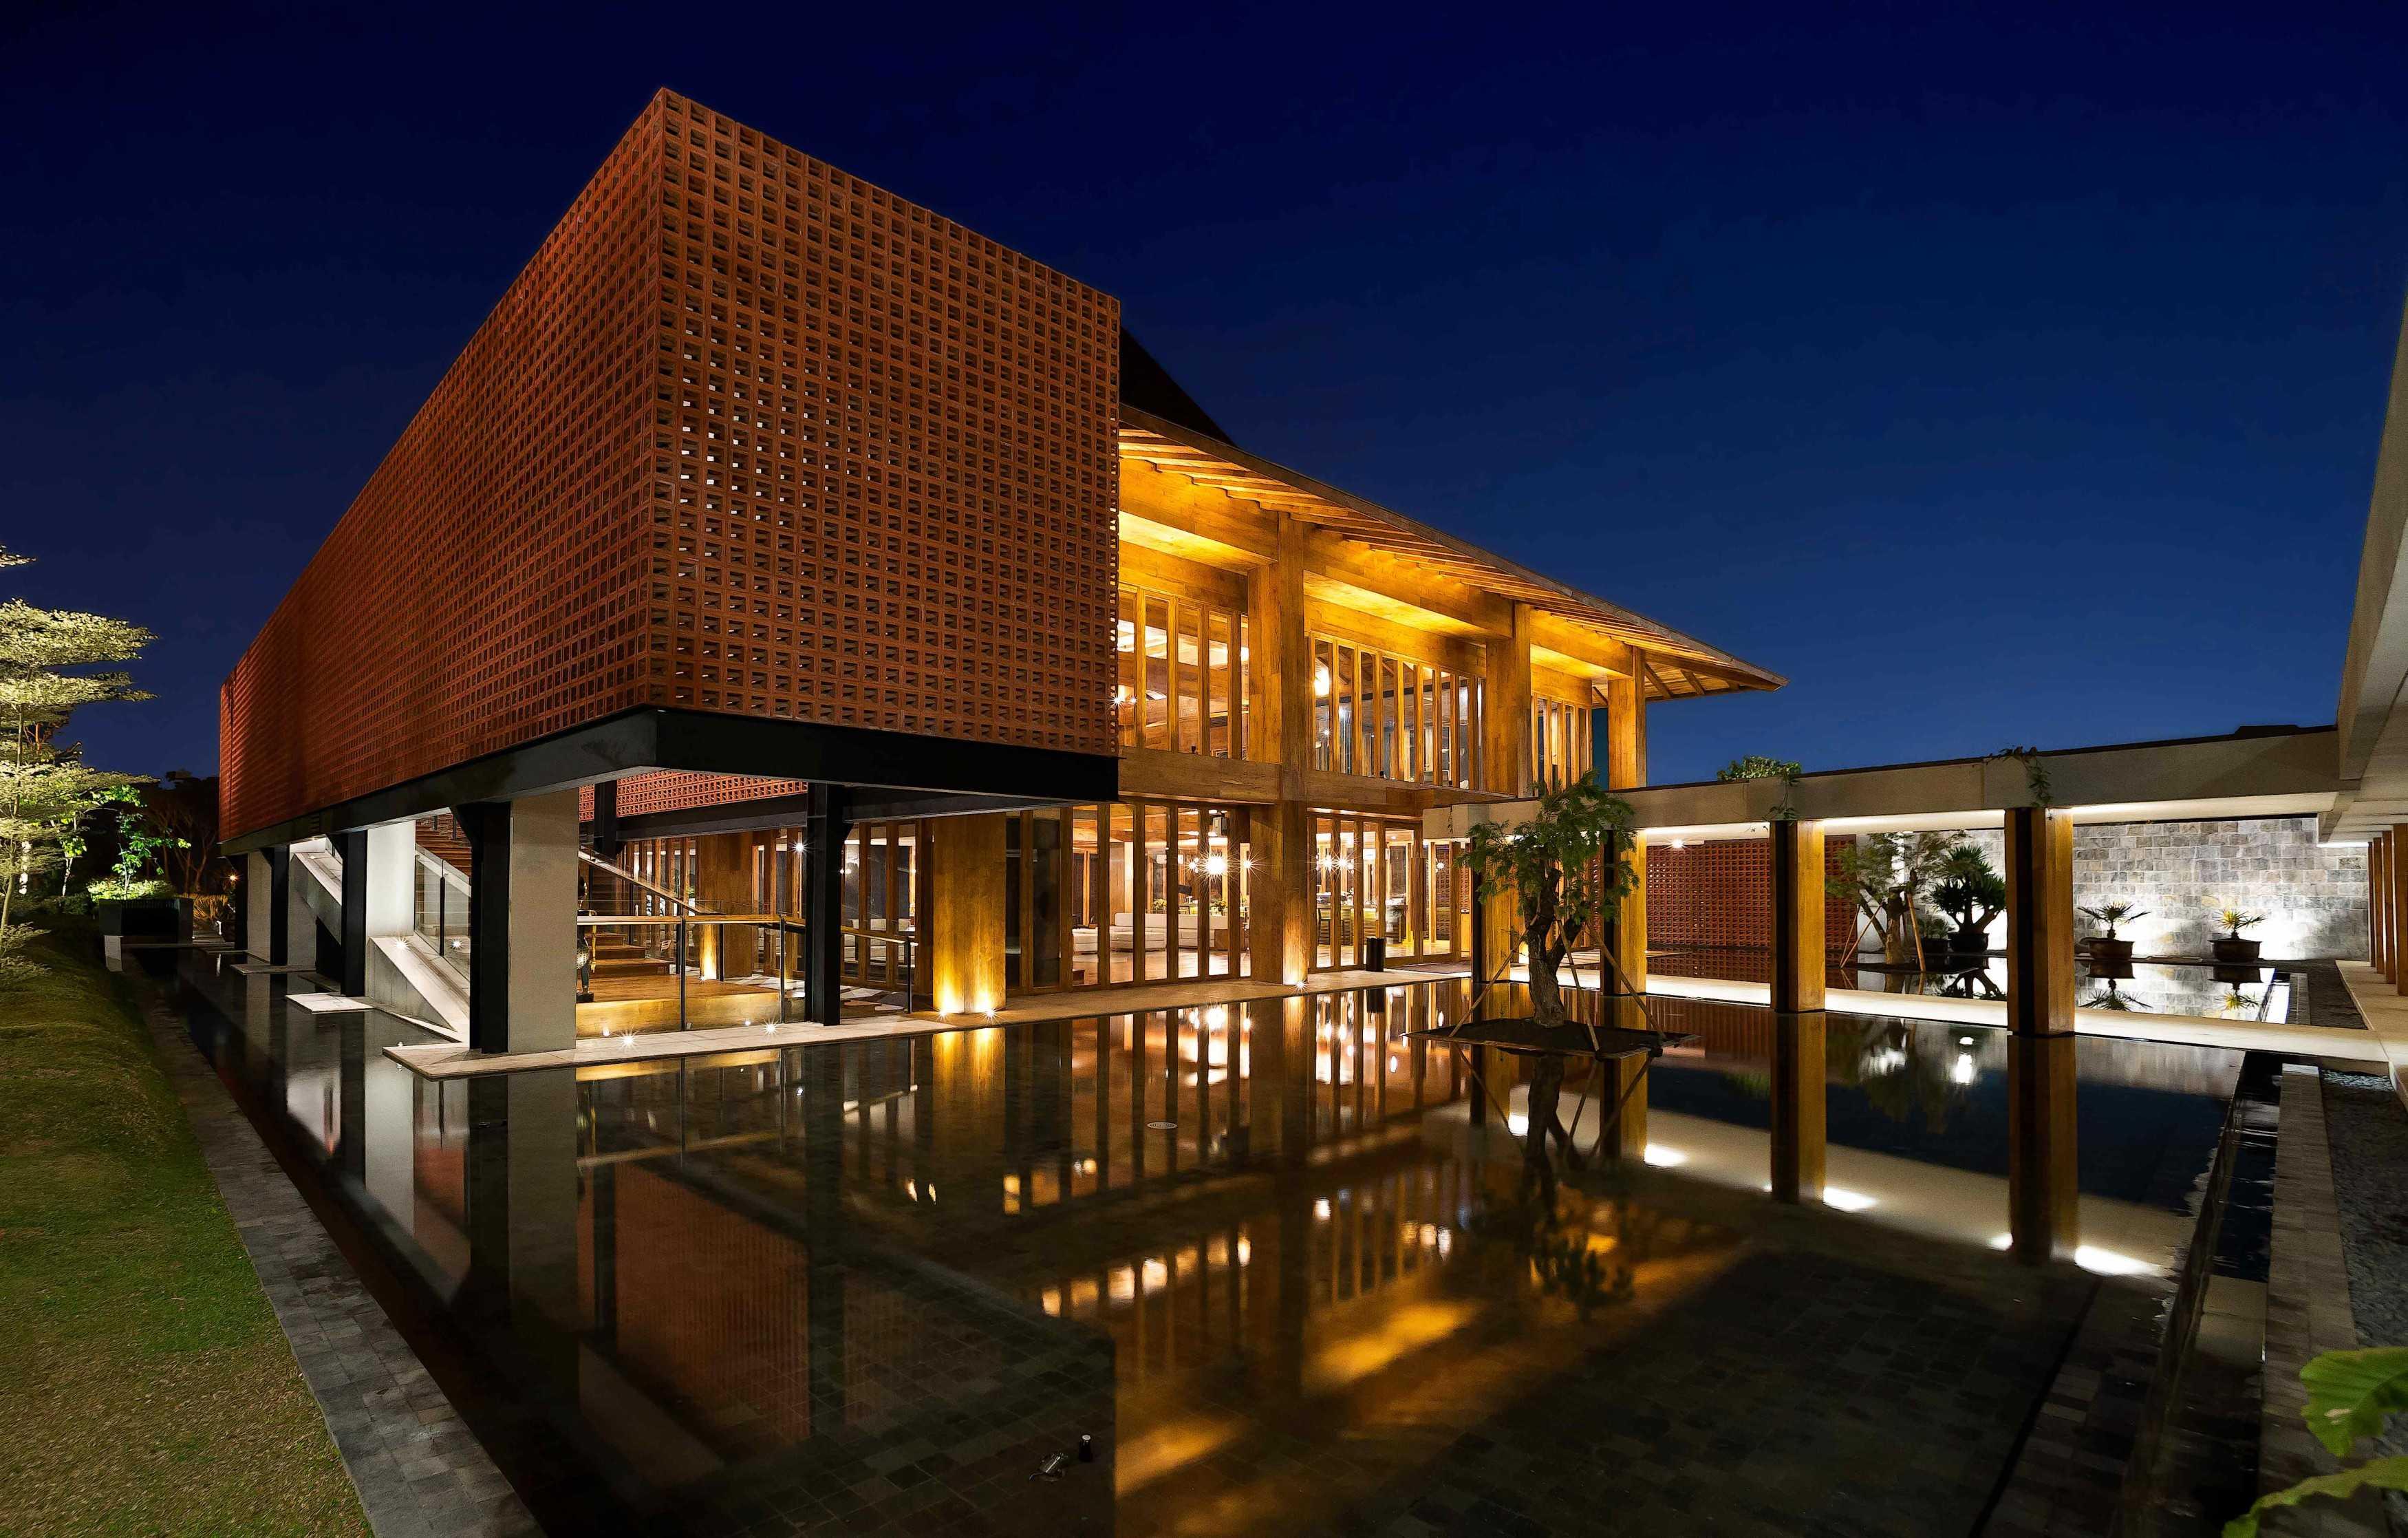 Mint-Ds Djati Lounge & Djoglo Bungalow Araya, Malang, East Java Araya, Malang, East Java Night View   16178